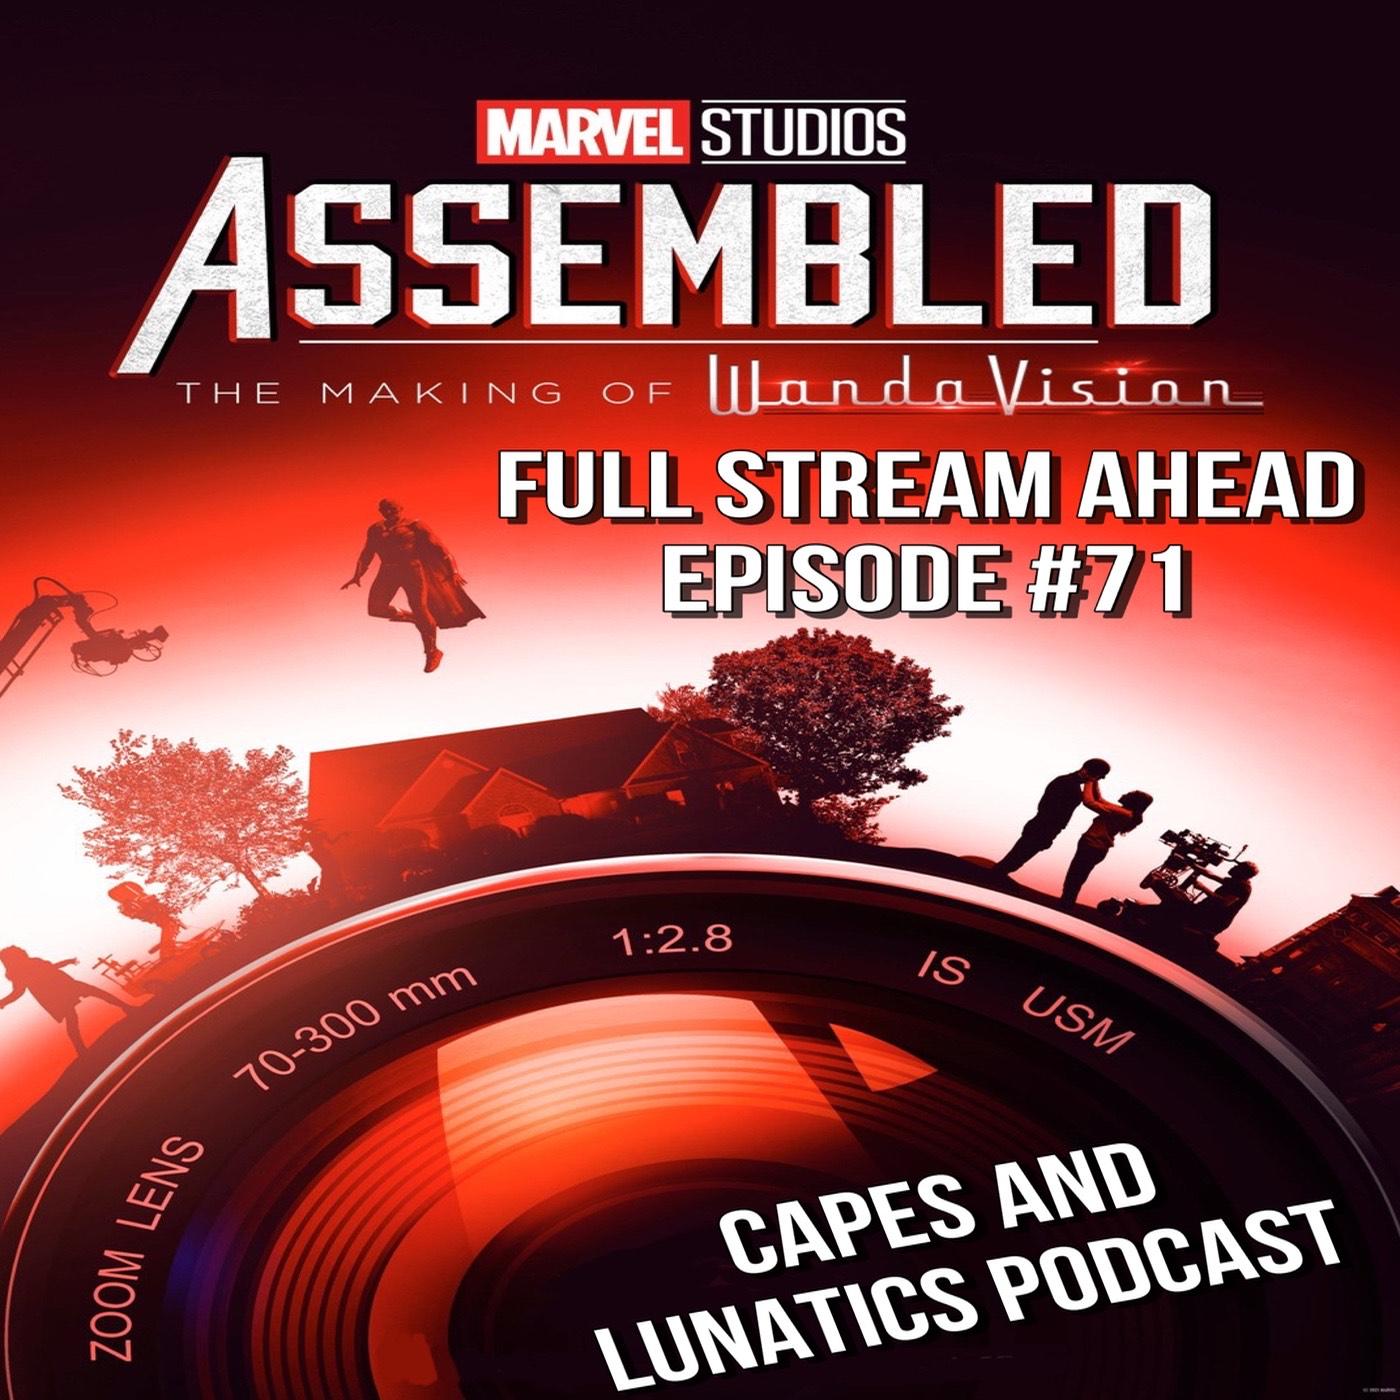 Marvel Studios Assembled: WandaVision